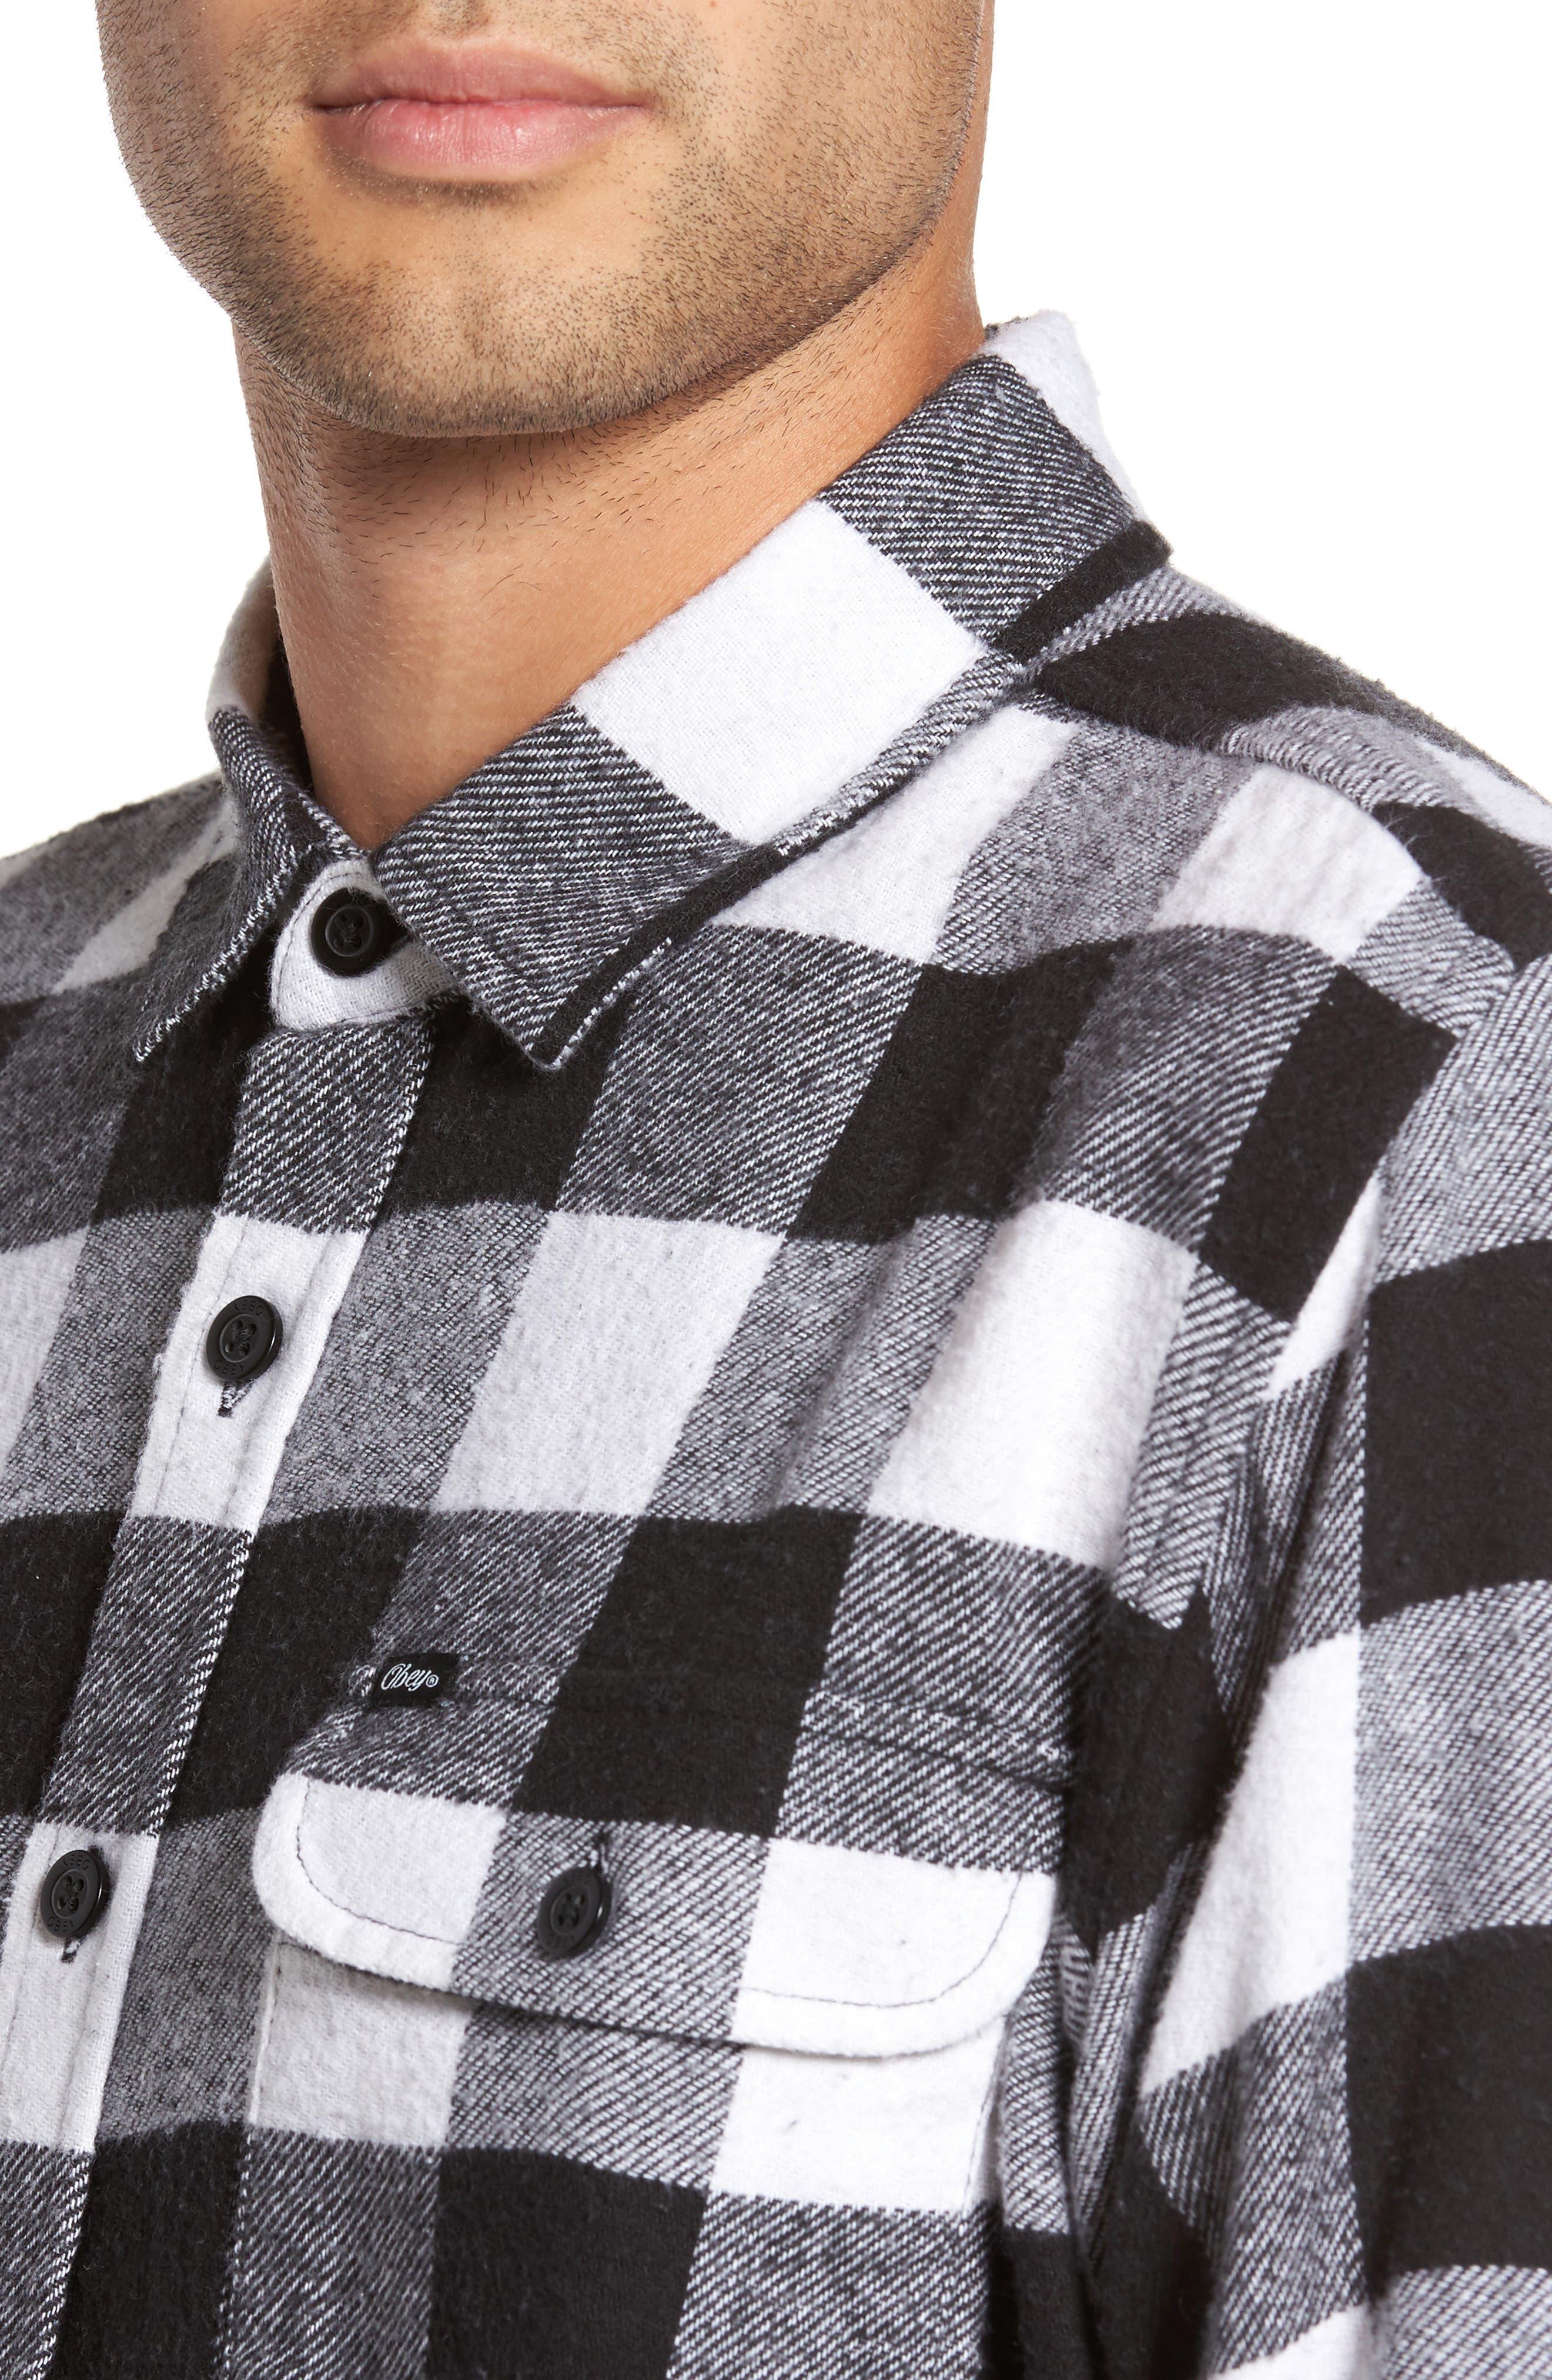 Trent Check Woven Shirt,                             Alternate thumbnail 4, color,                             002